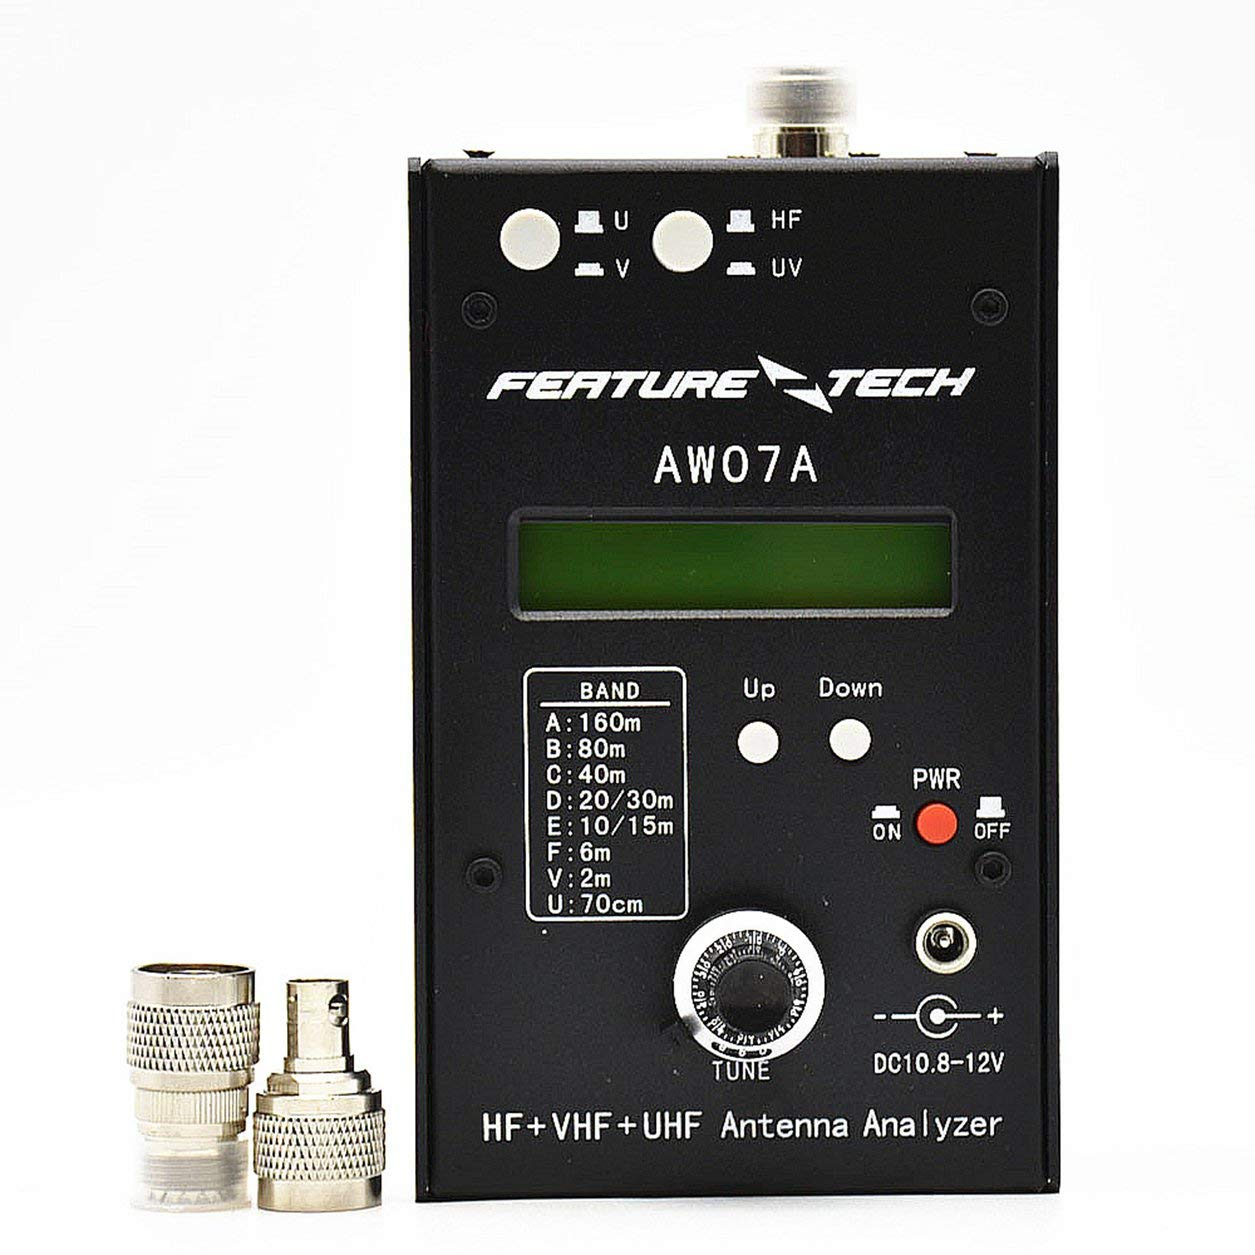 AW0 7Aの周波数計RA-07A SWR HF VHF UHFアンテナインピーダンスアナライザメーター、ブラック B07MZQ26JM